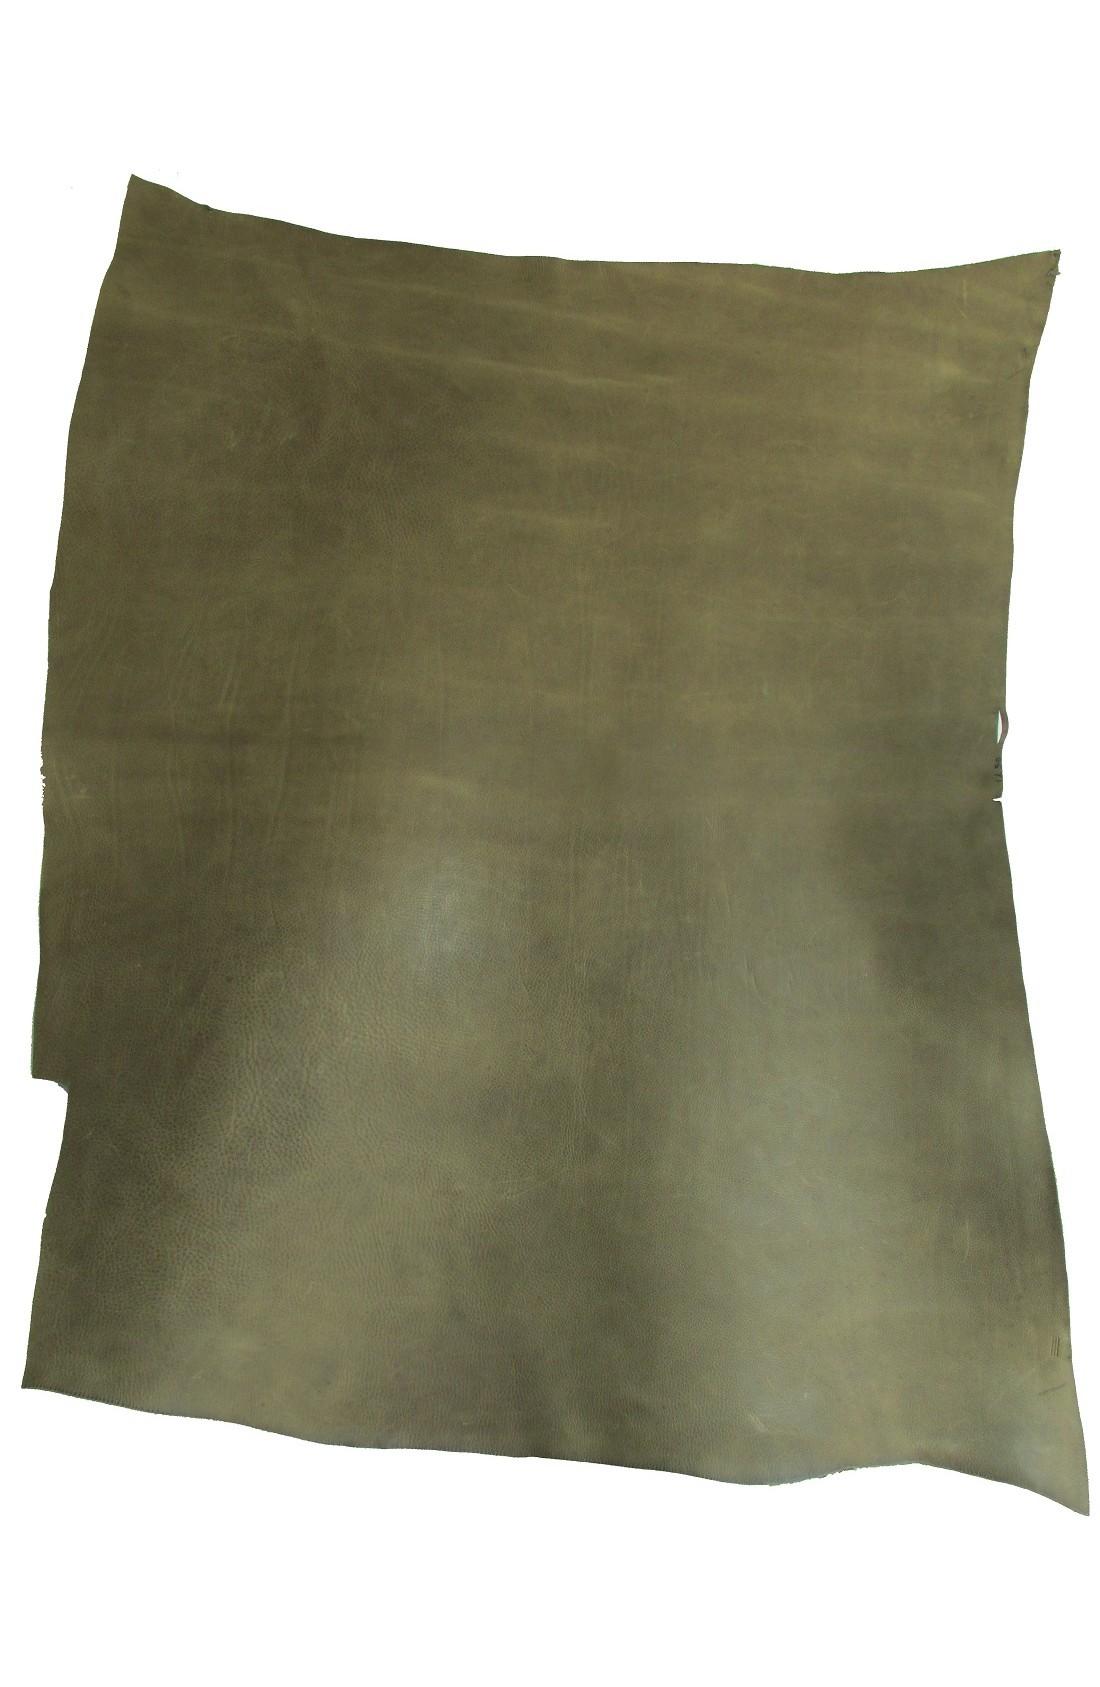 art. 49 KANSAS CUOIO var.61 militare